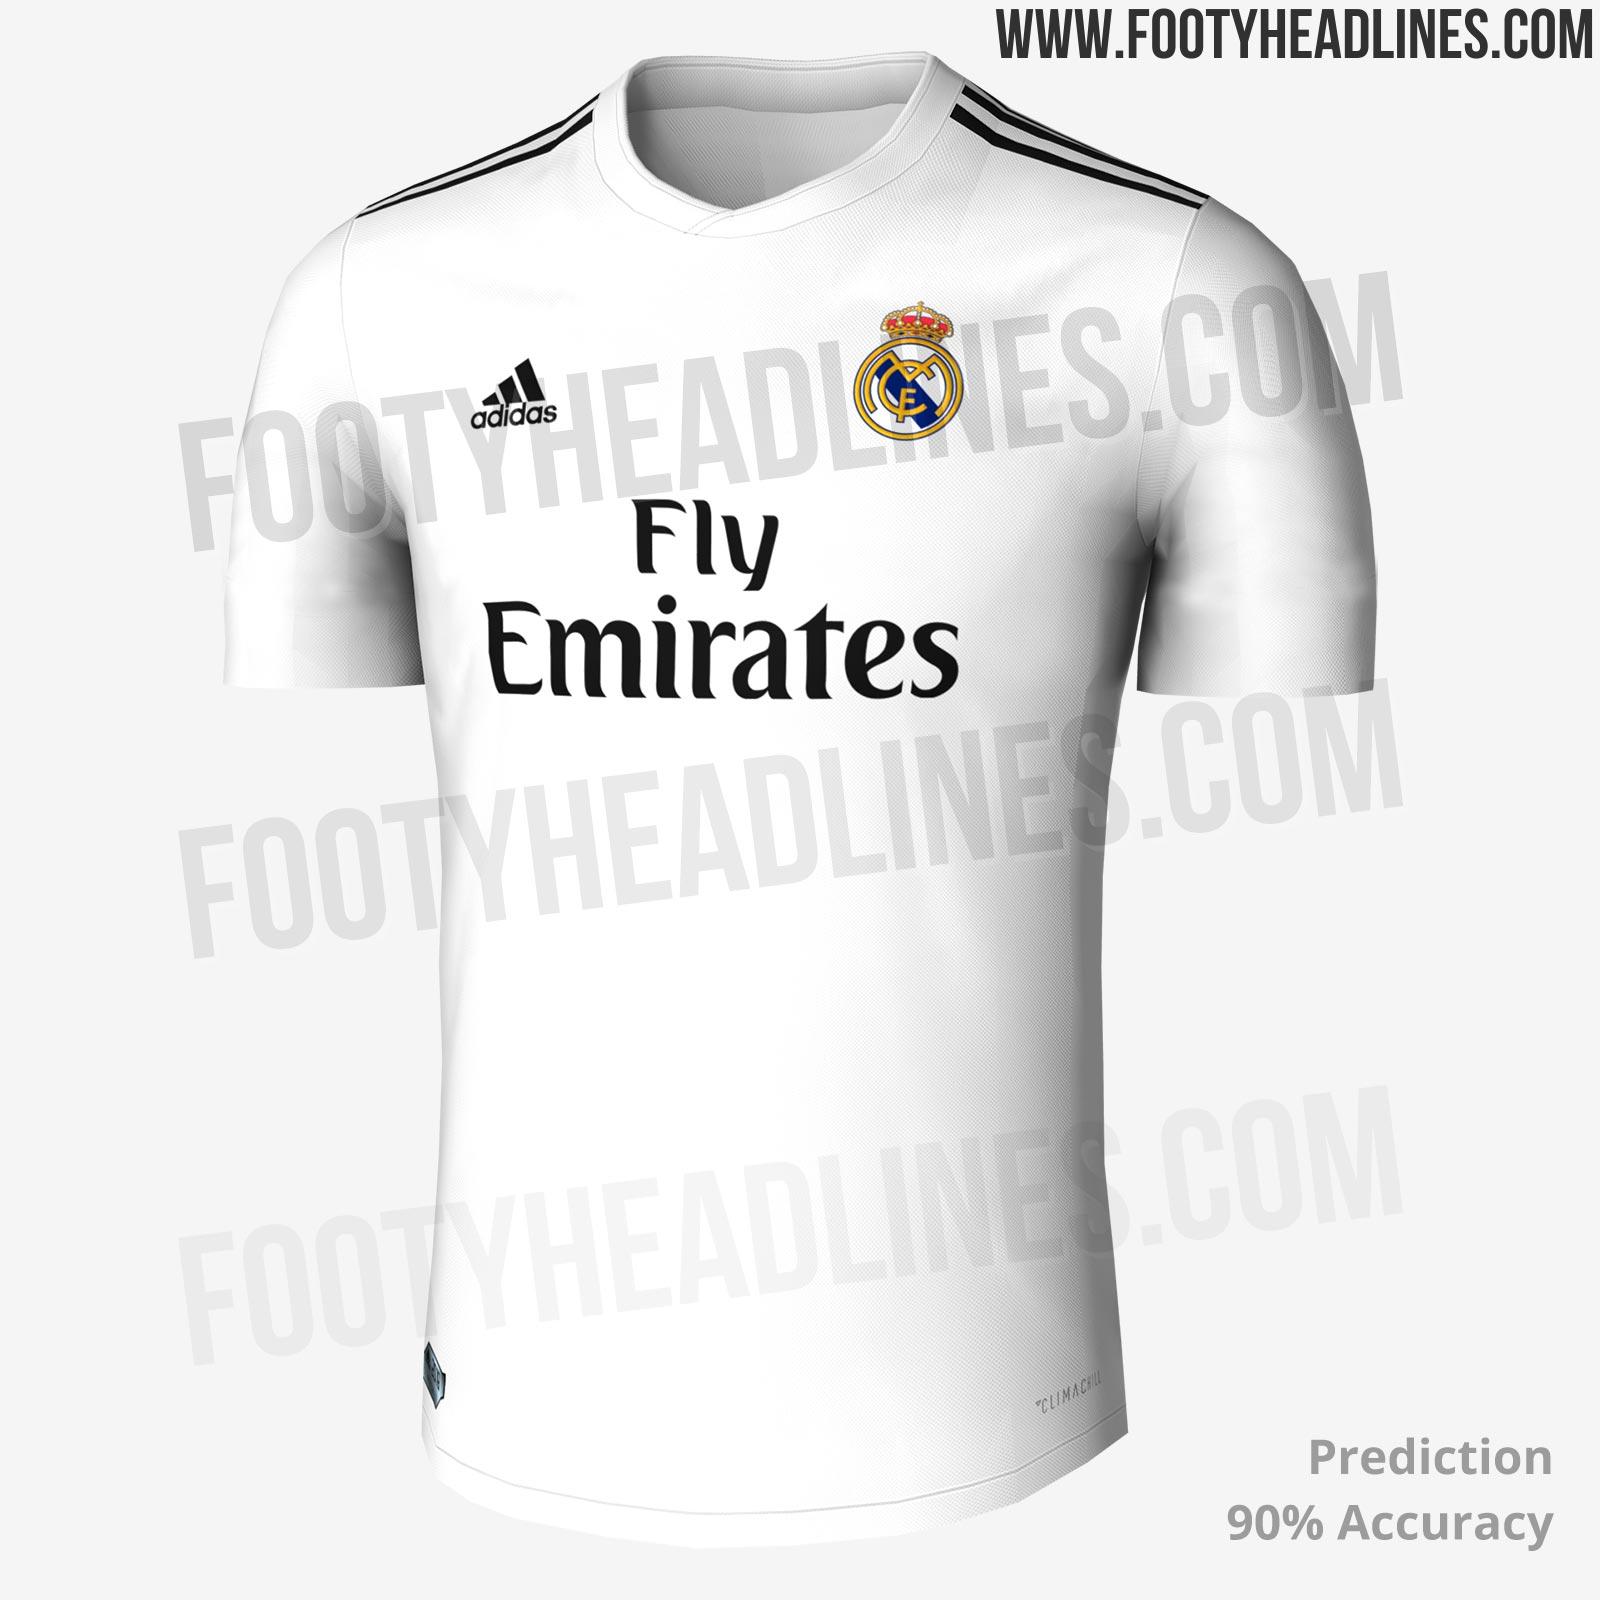 f9107269779 Sieht So Das Neue Heimtrikot Von Real Madrid 2018 19 Aus Goal Com. Real  Madrid Home Shirt ...